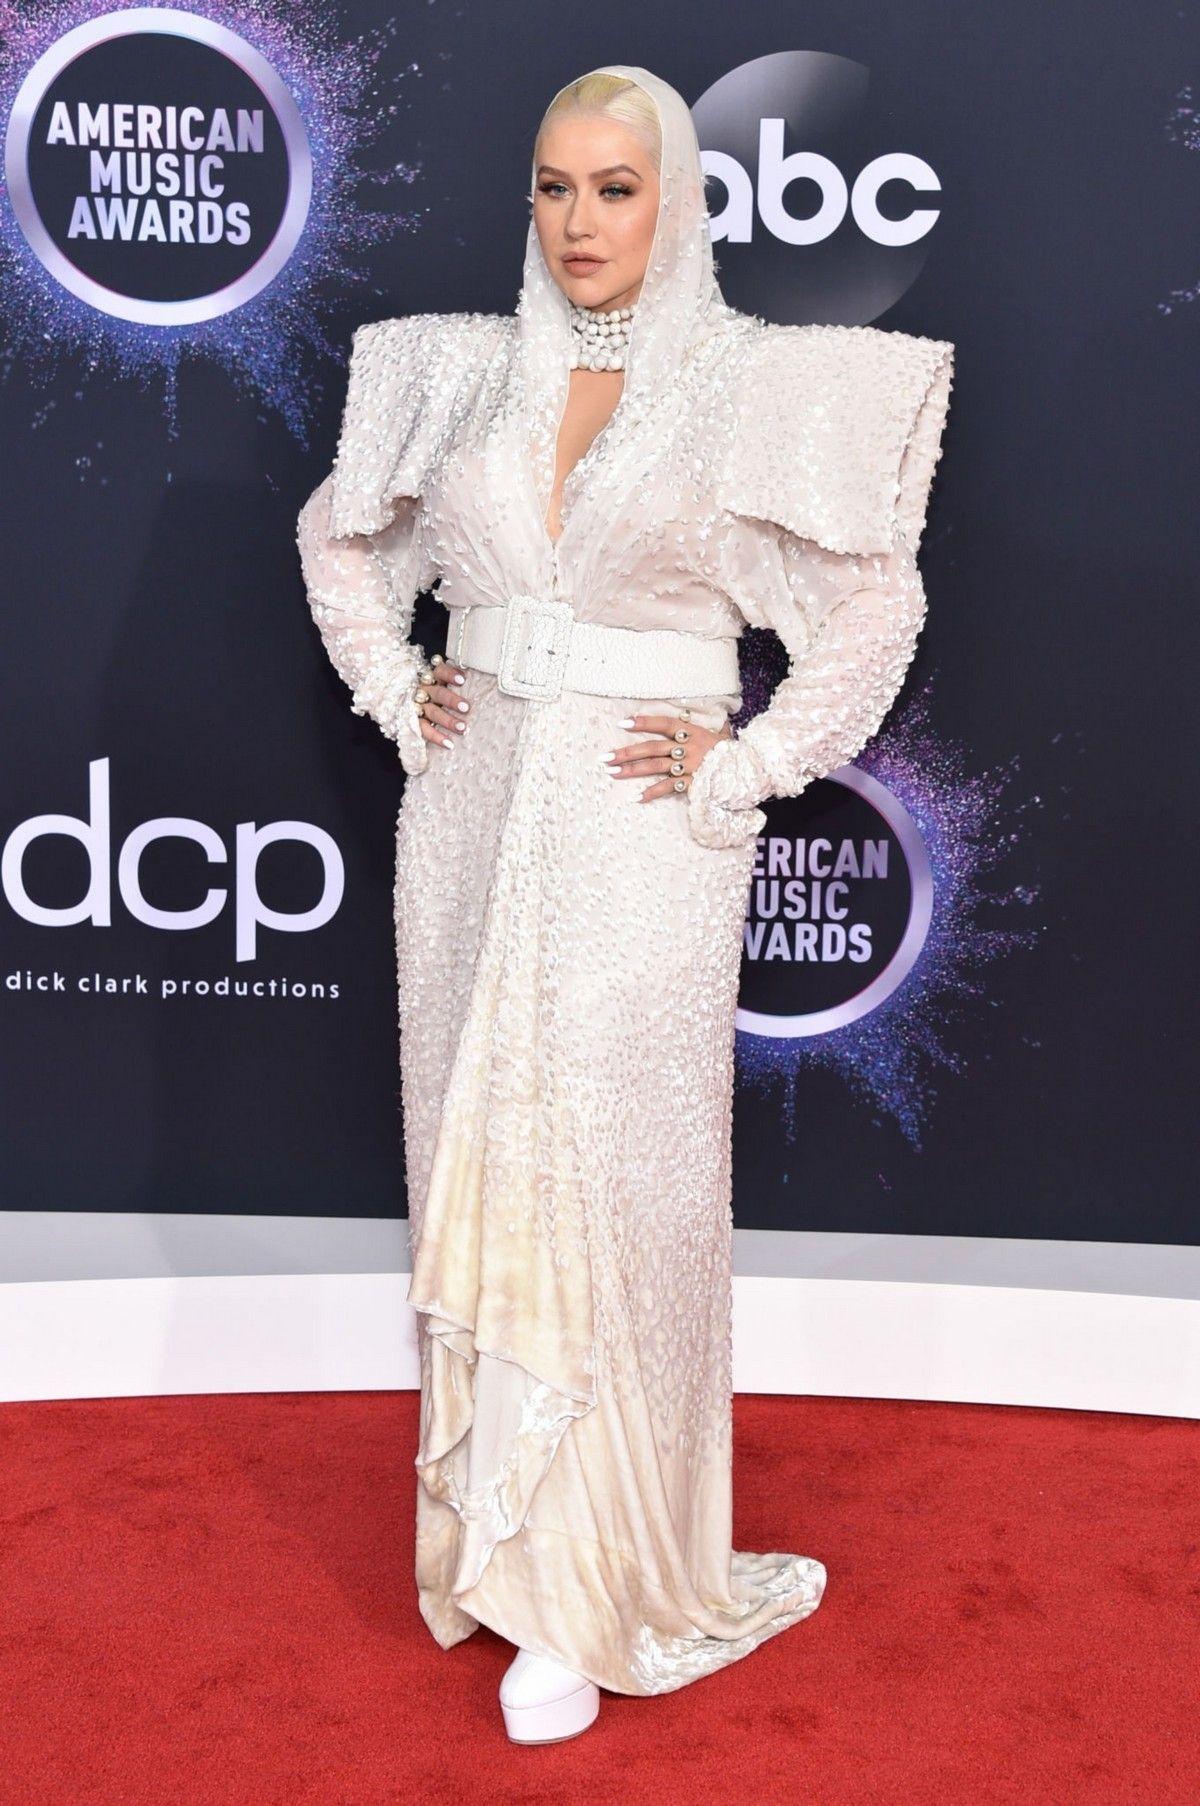 Christina Aguilera attends 2019 American Music Awards at